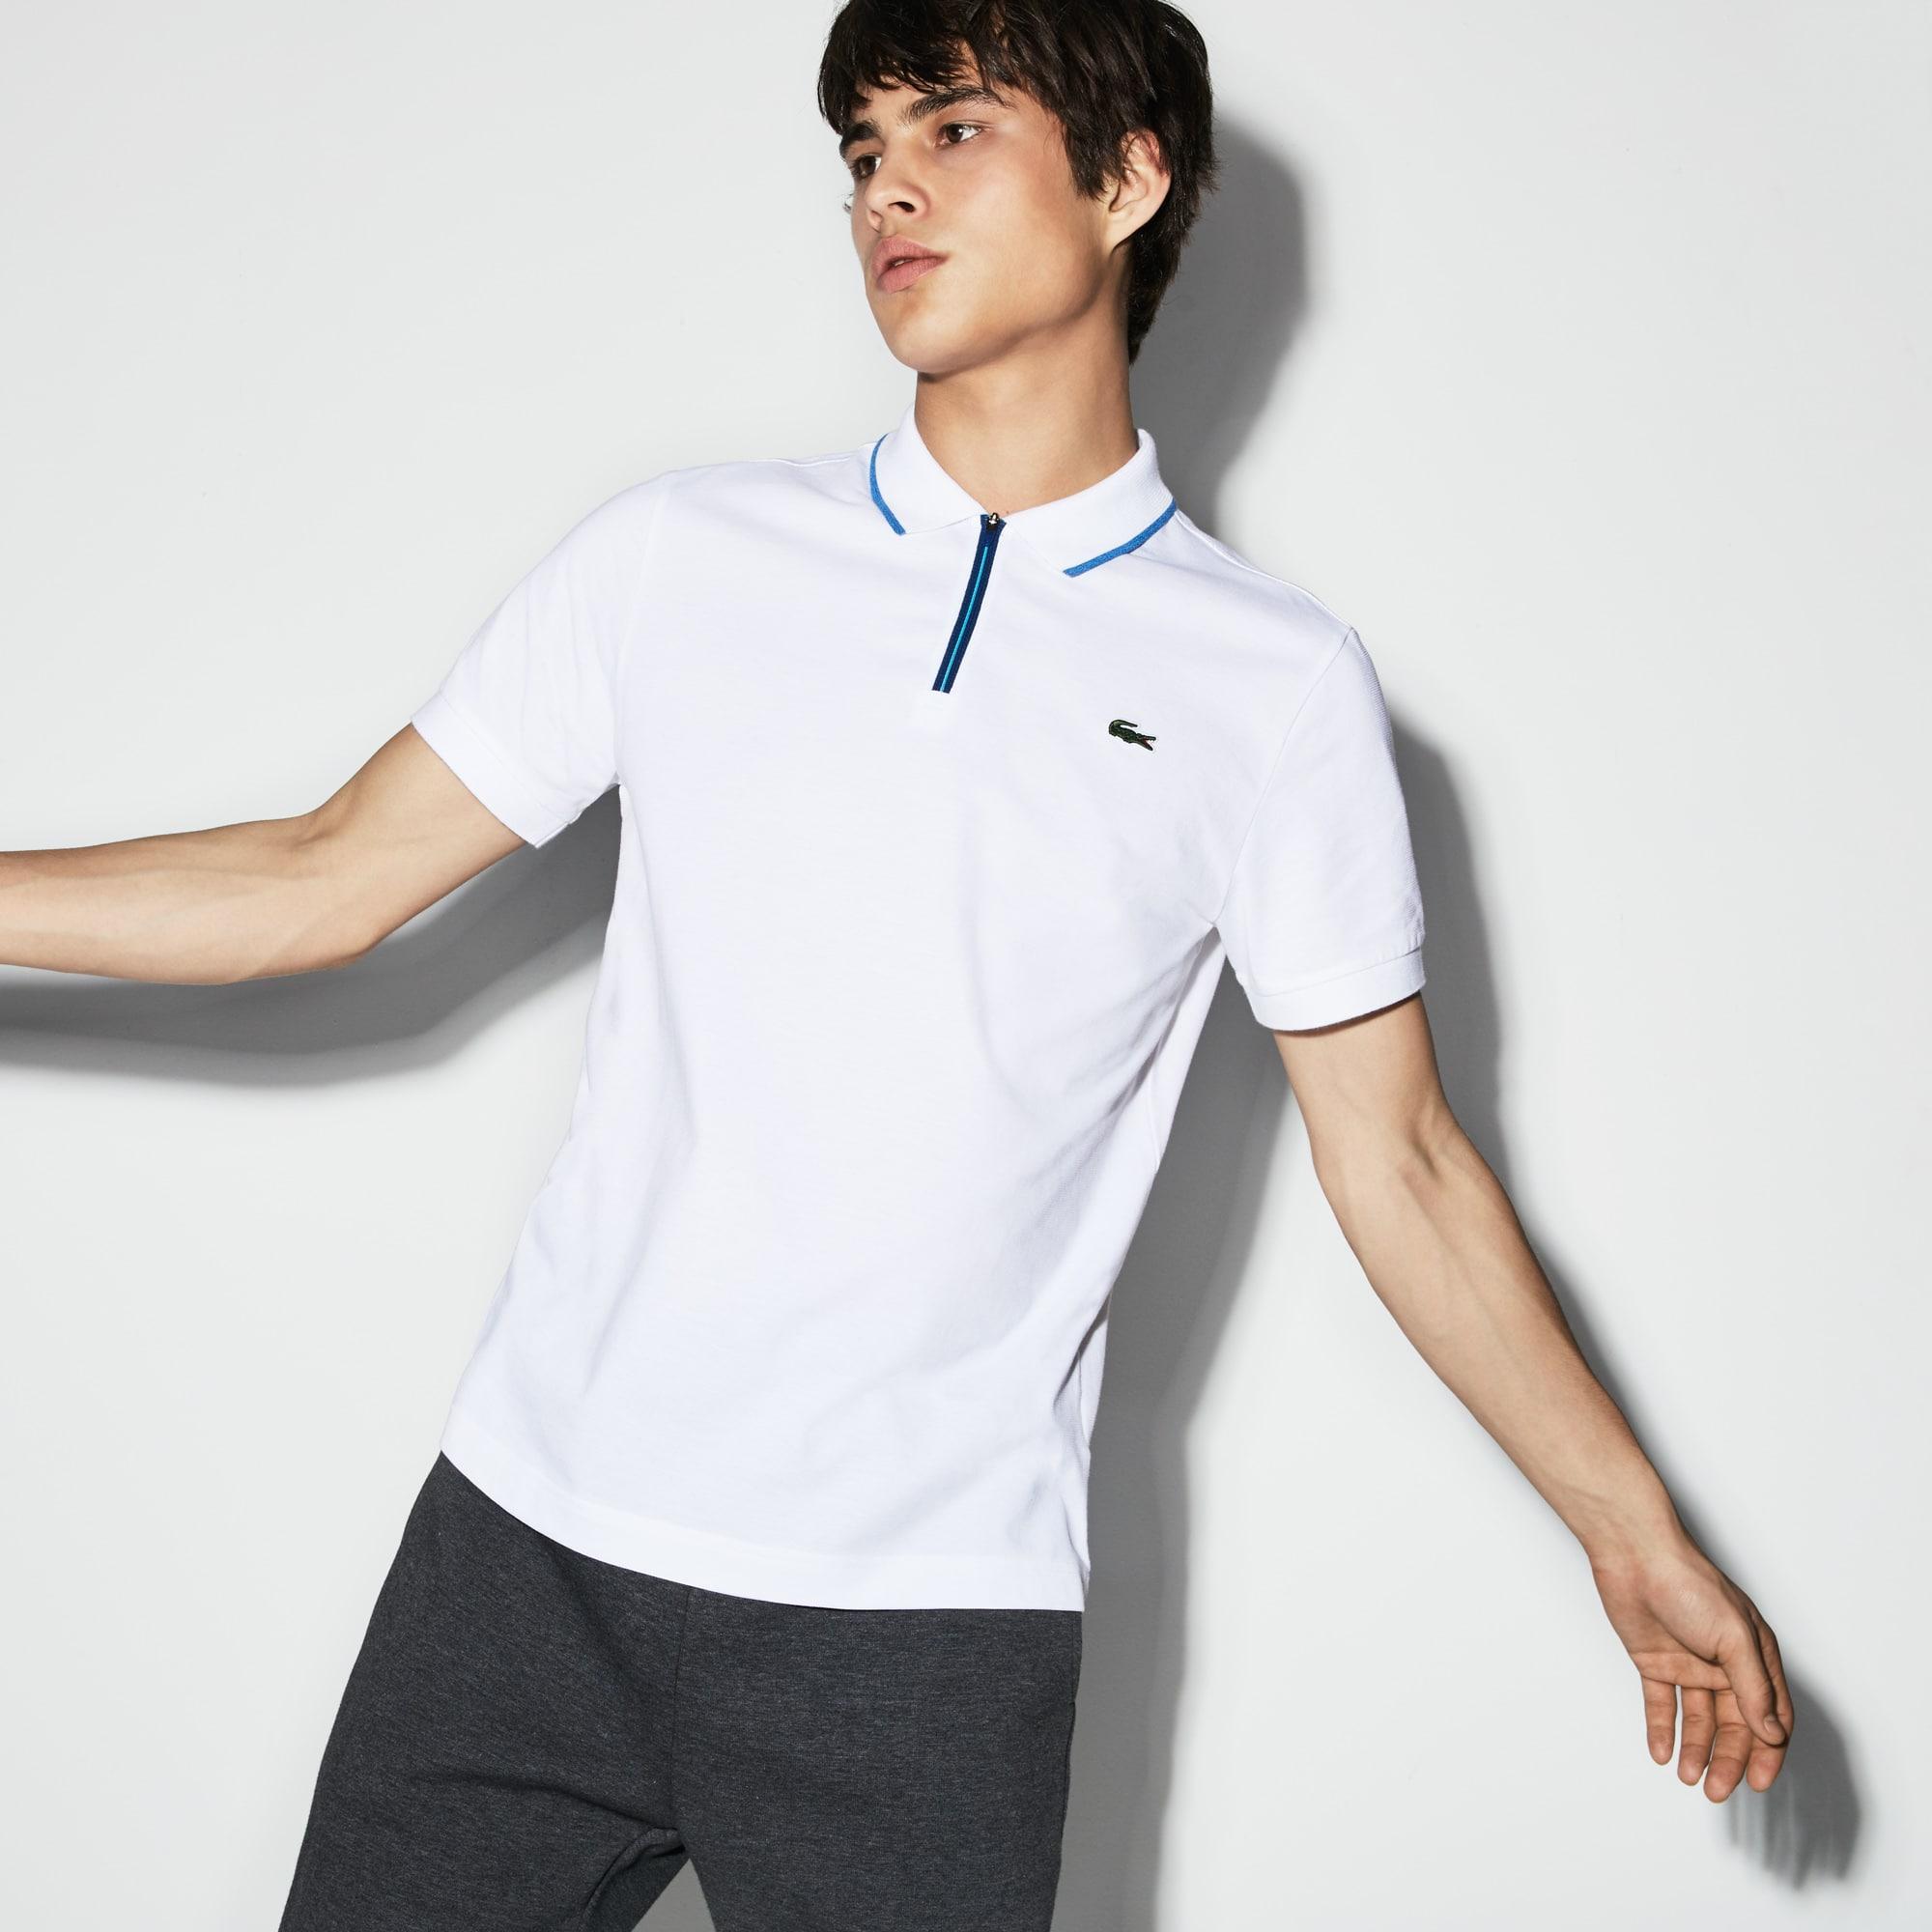 Polo Tenis Lacoste SPORT en algodón ultra ligero con detalles en contraste